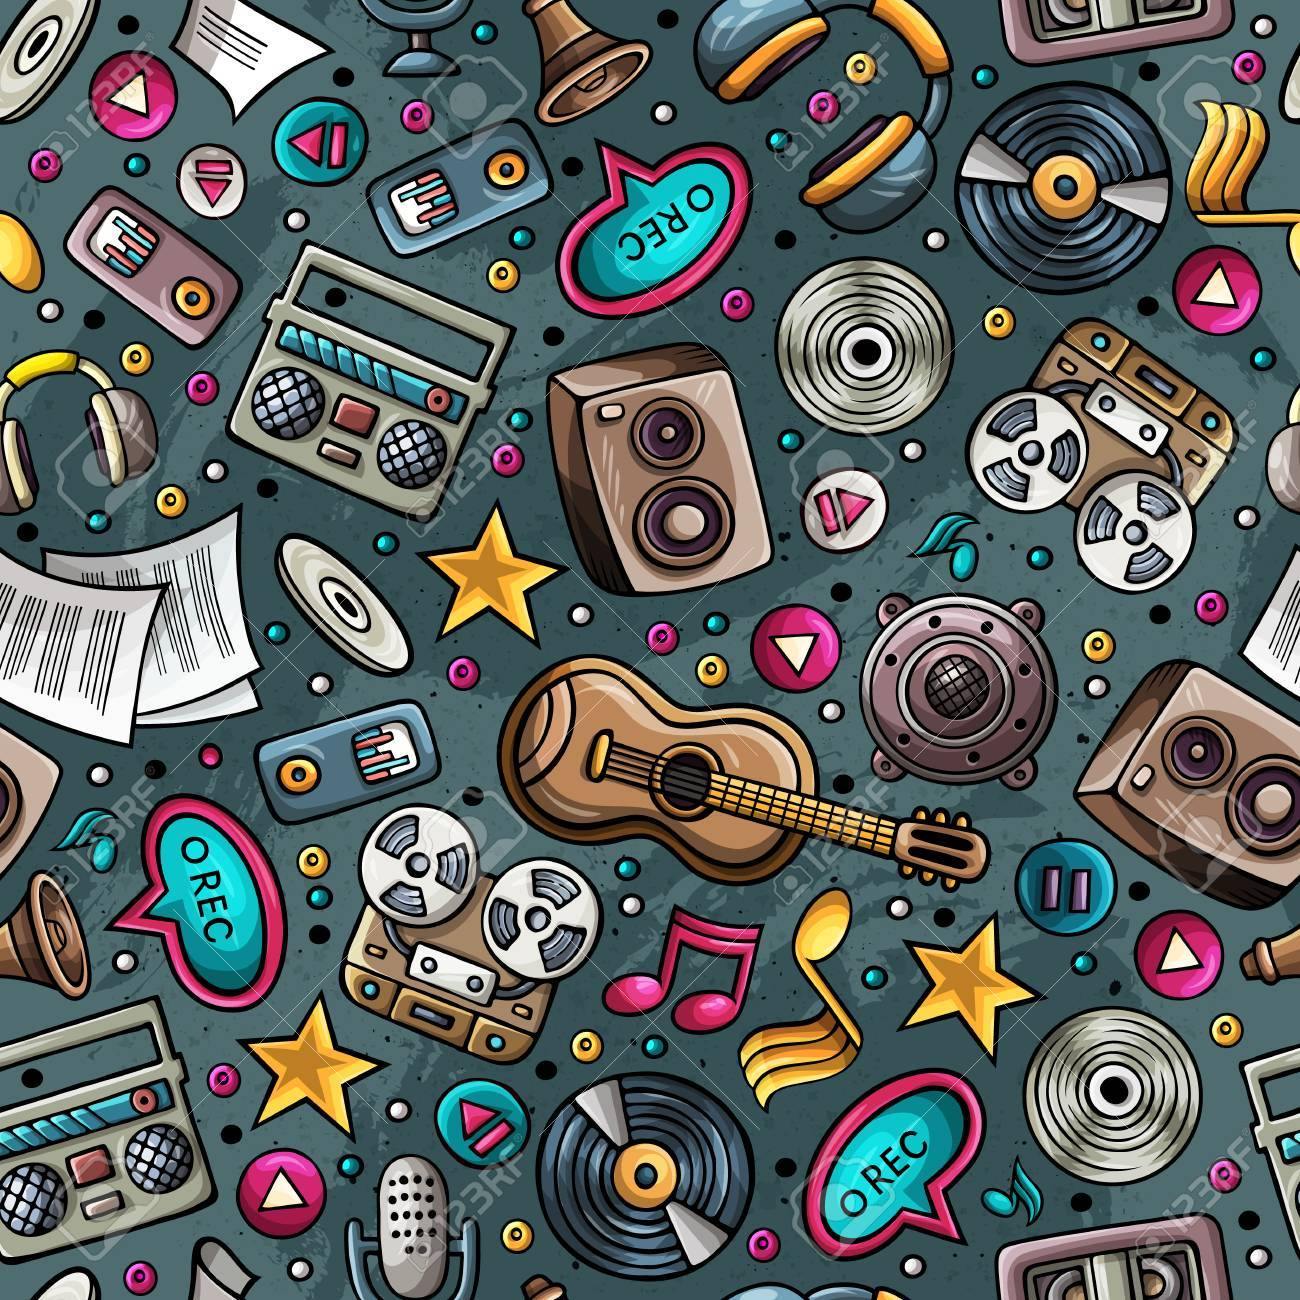 1300x1300 Cartoon Hand Drawn Musical Instruments Seamless Pattern. Lots